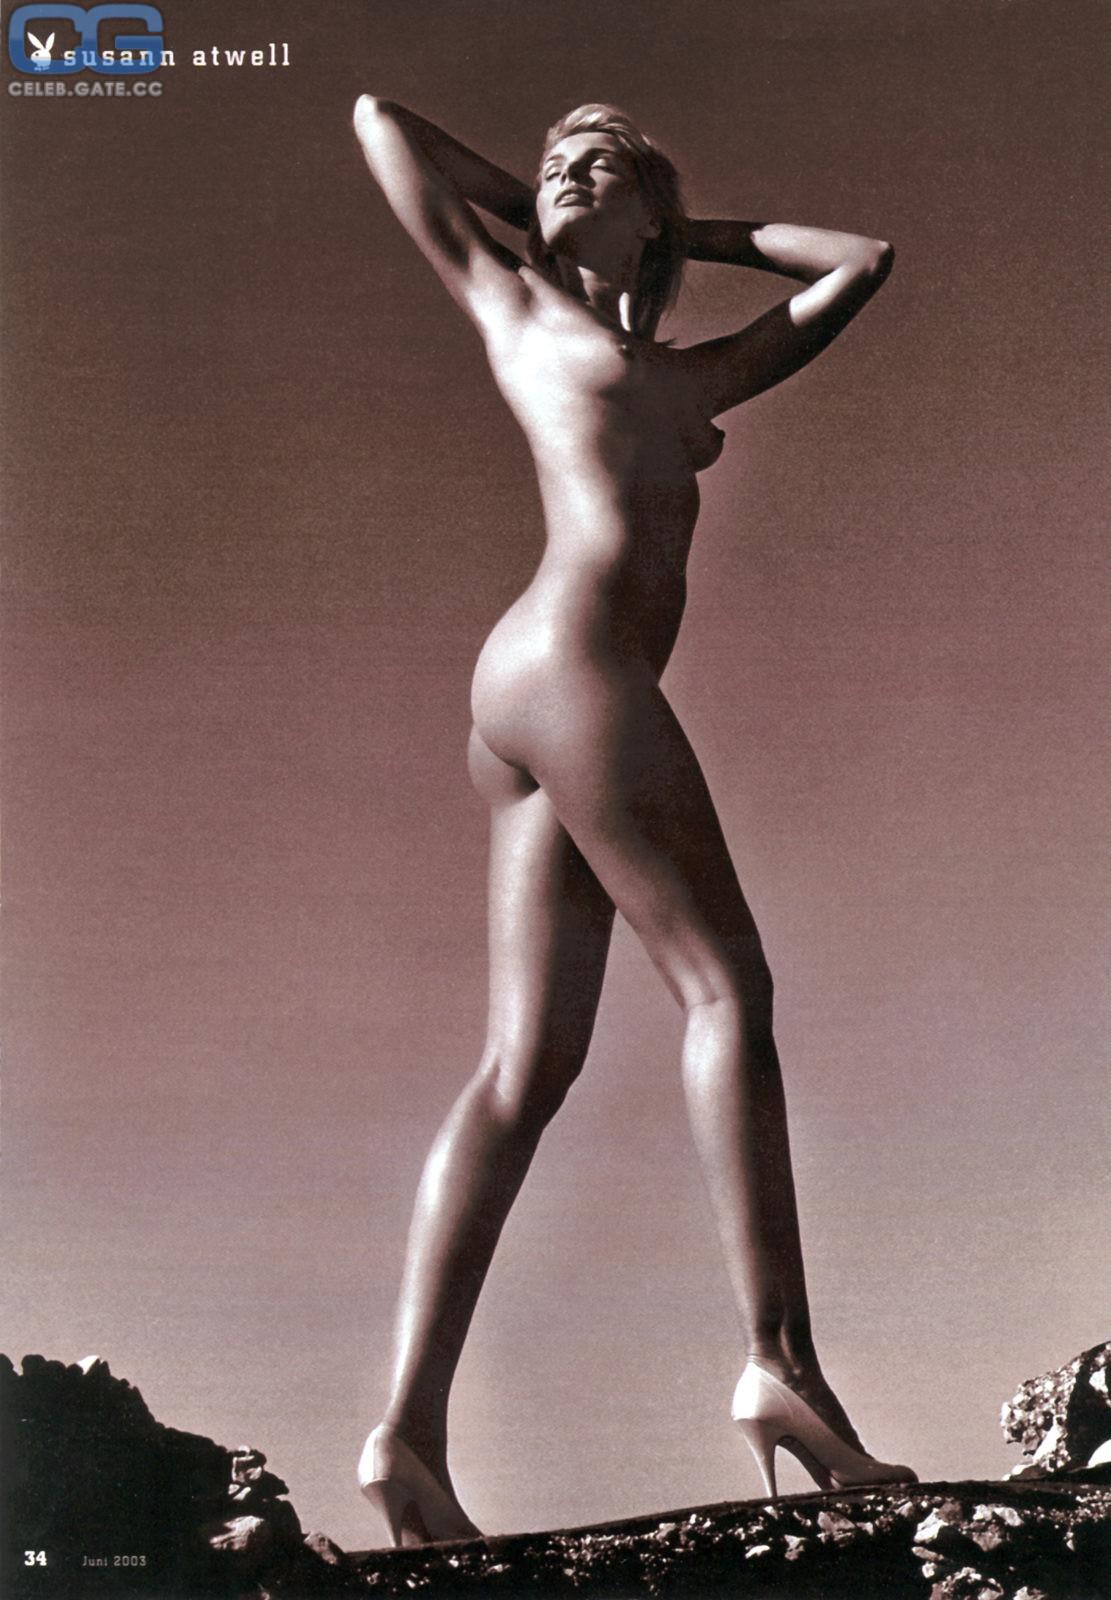 Atwell nude susann Susann Atwell